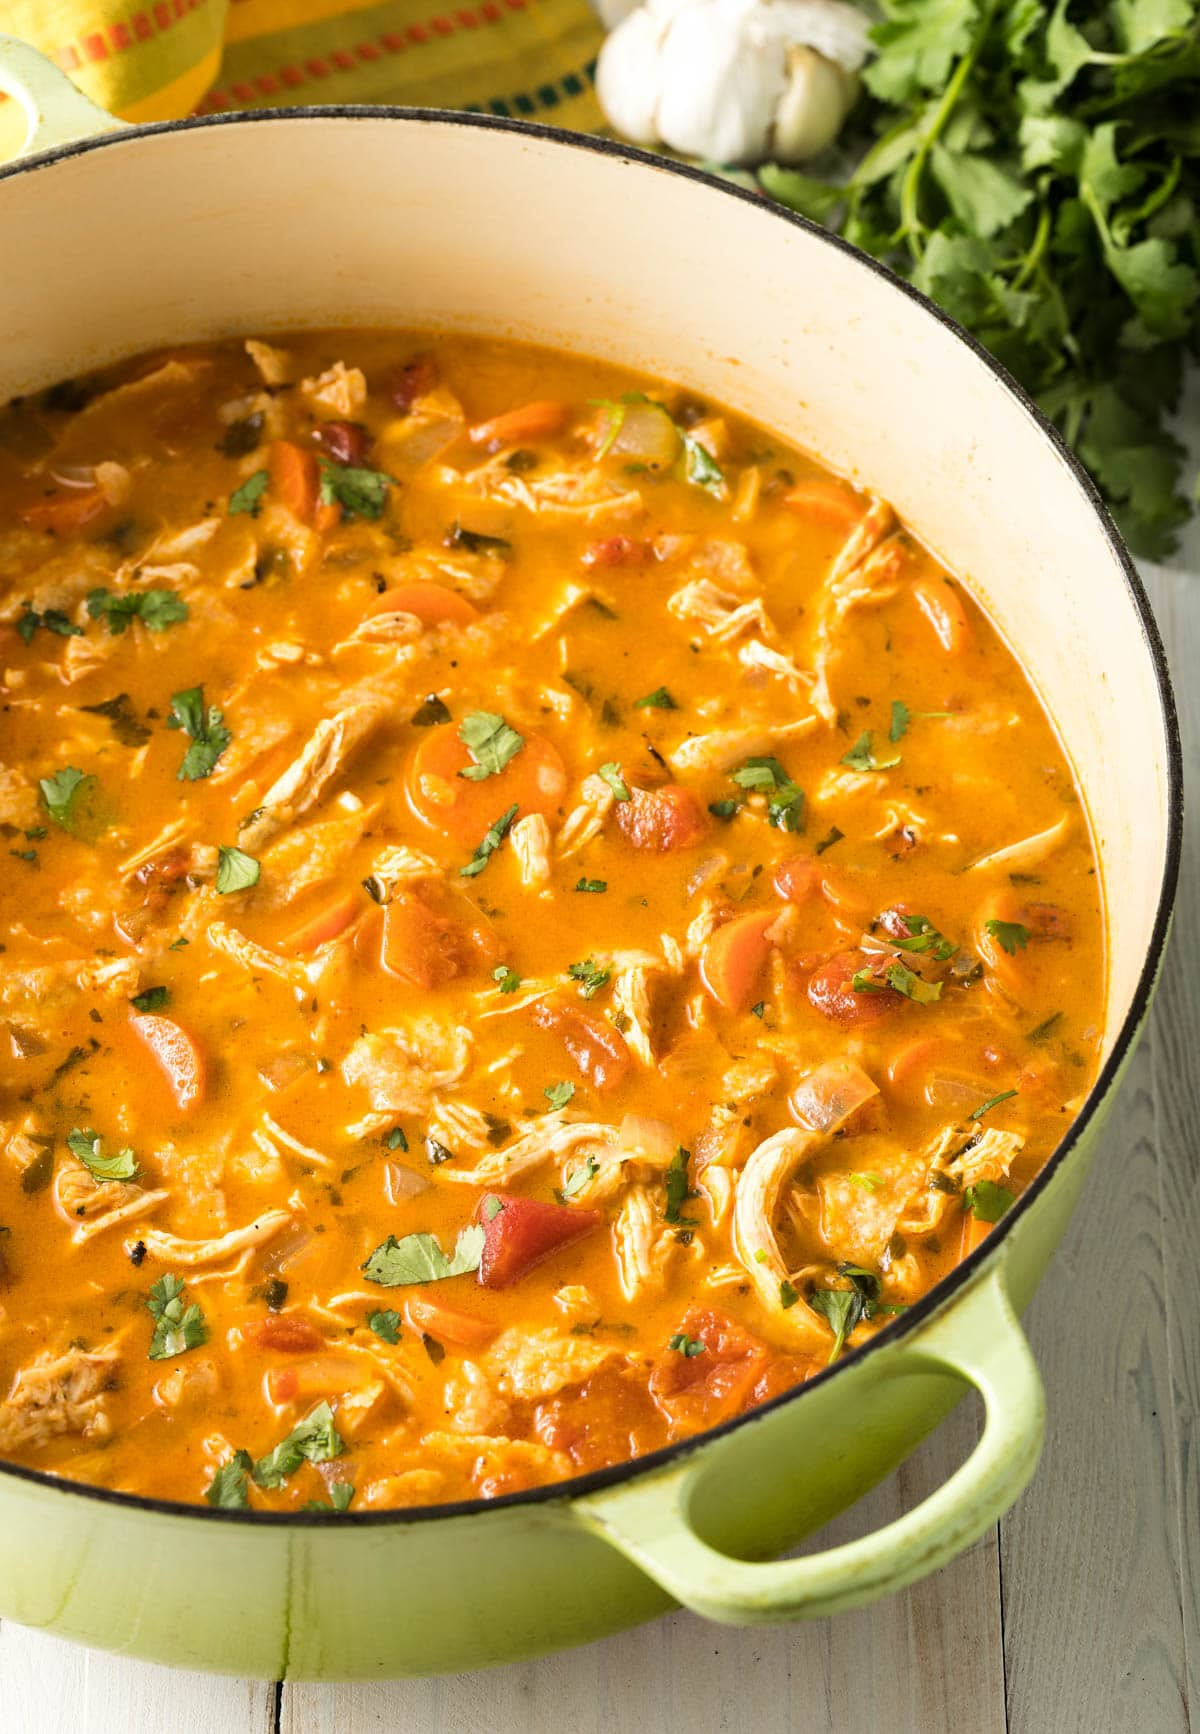 The Best Ever Chicken Tortilla Soup Recipe #ASpicyPerspective  #instantpot #slowcooker